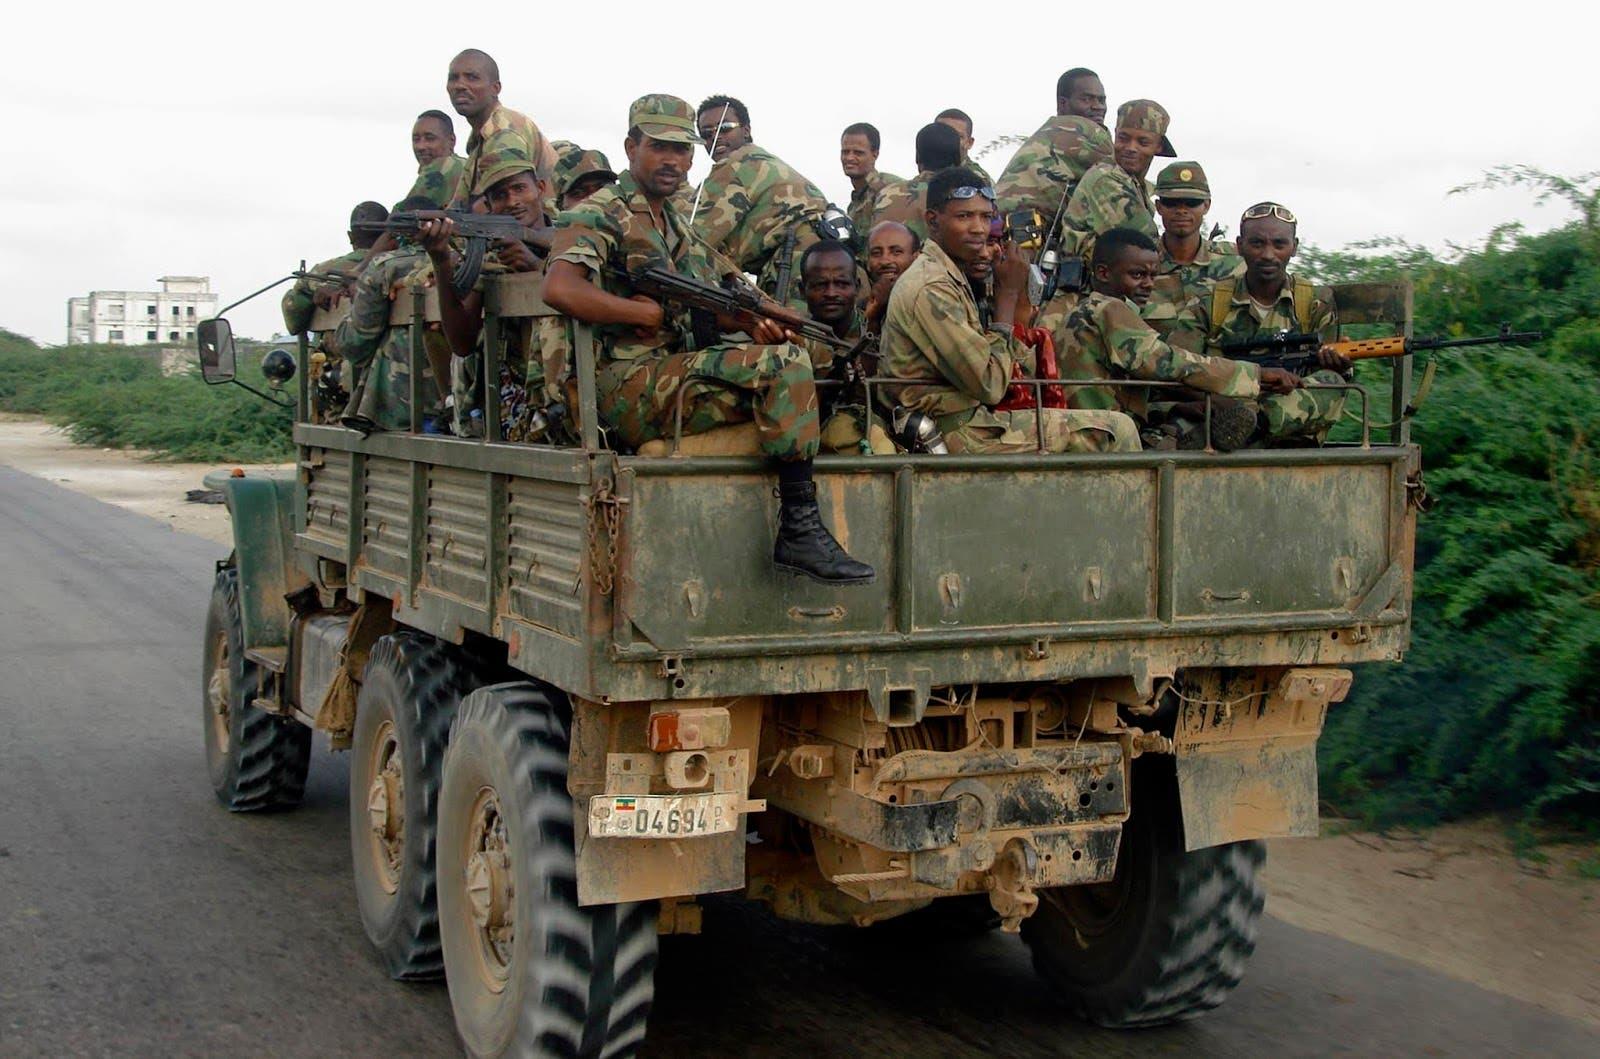 Ethiopian troops hit by explosion in Somalia